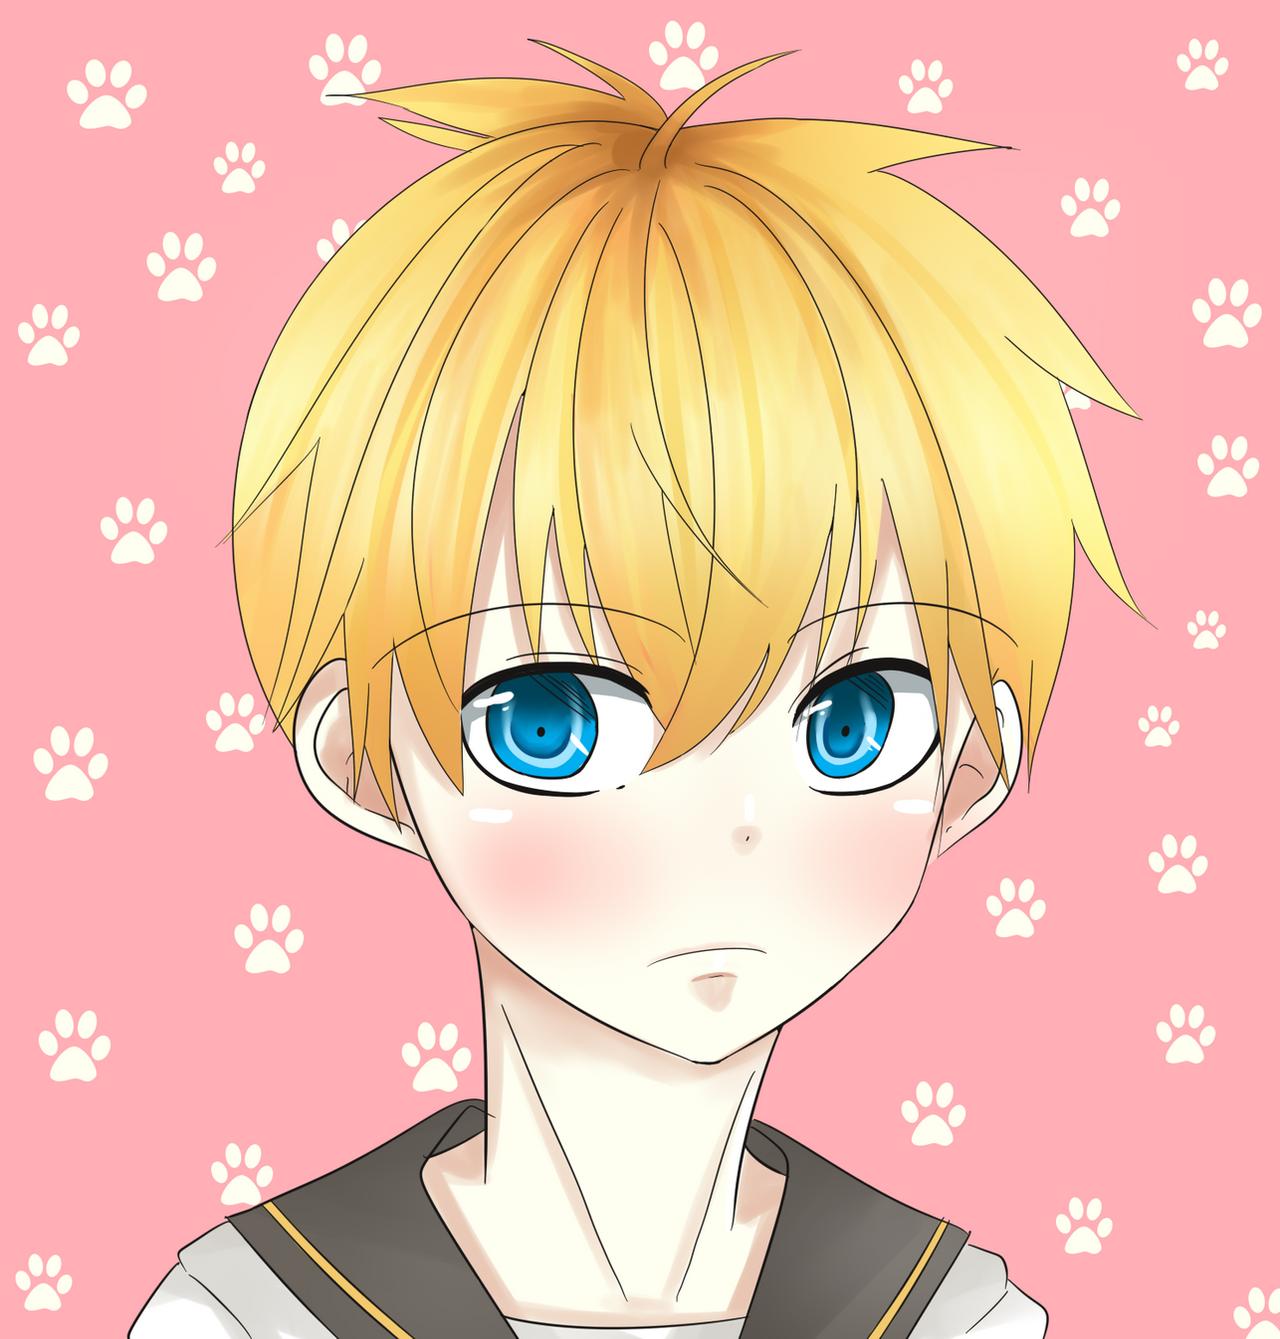 Anime Shota Boy